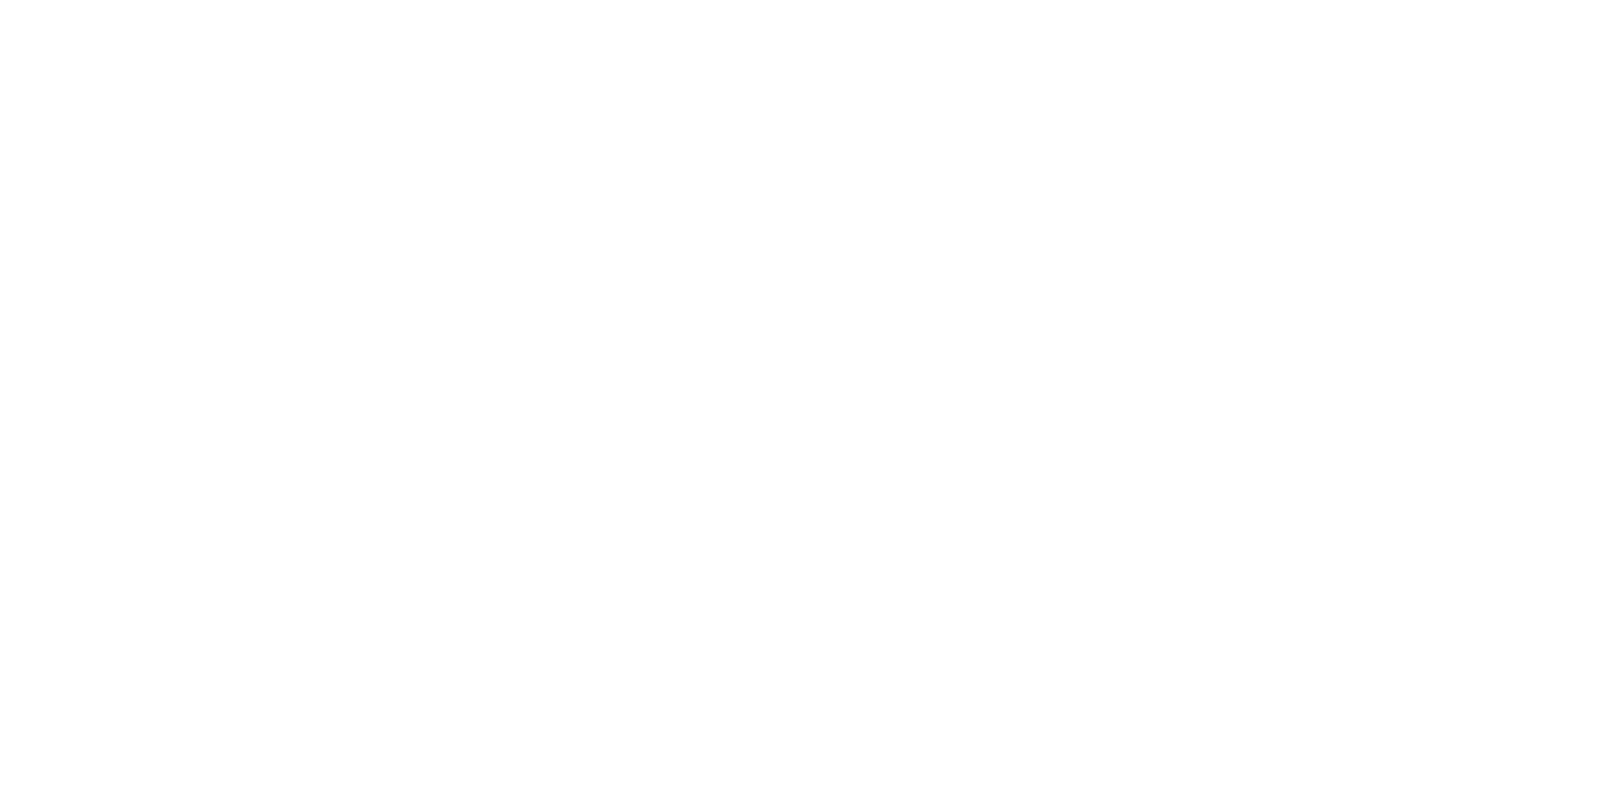 Helsana-Claim_weiss_DE